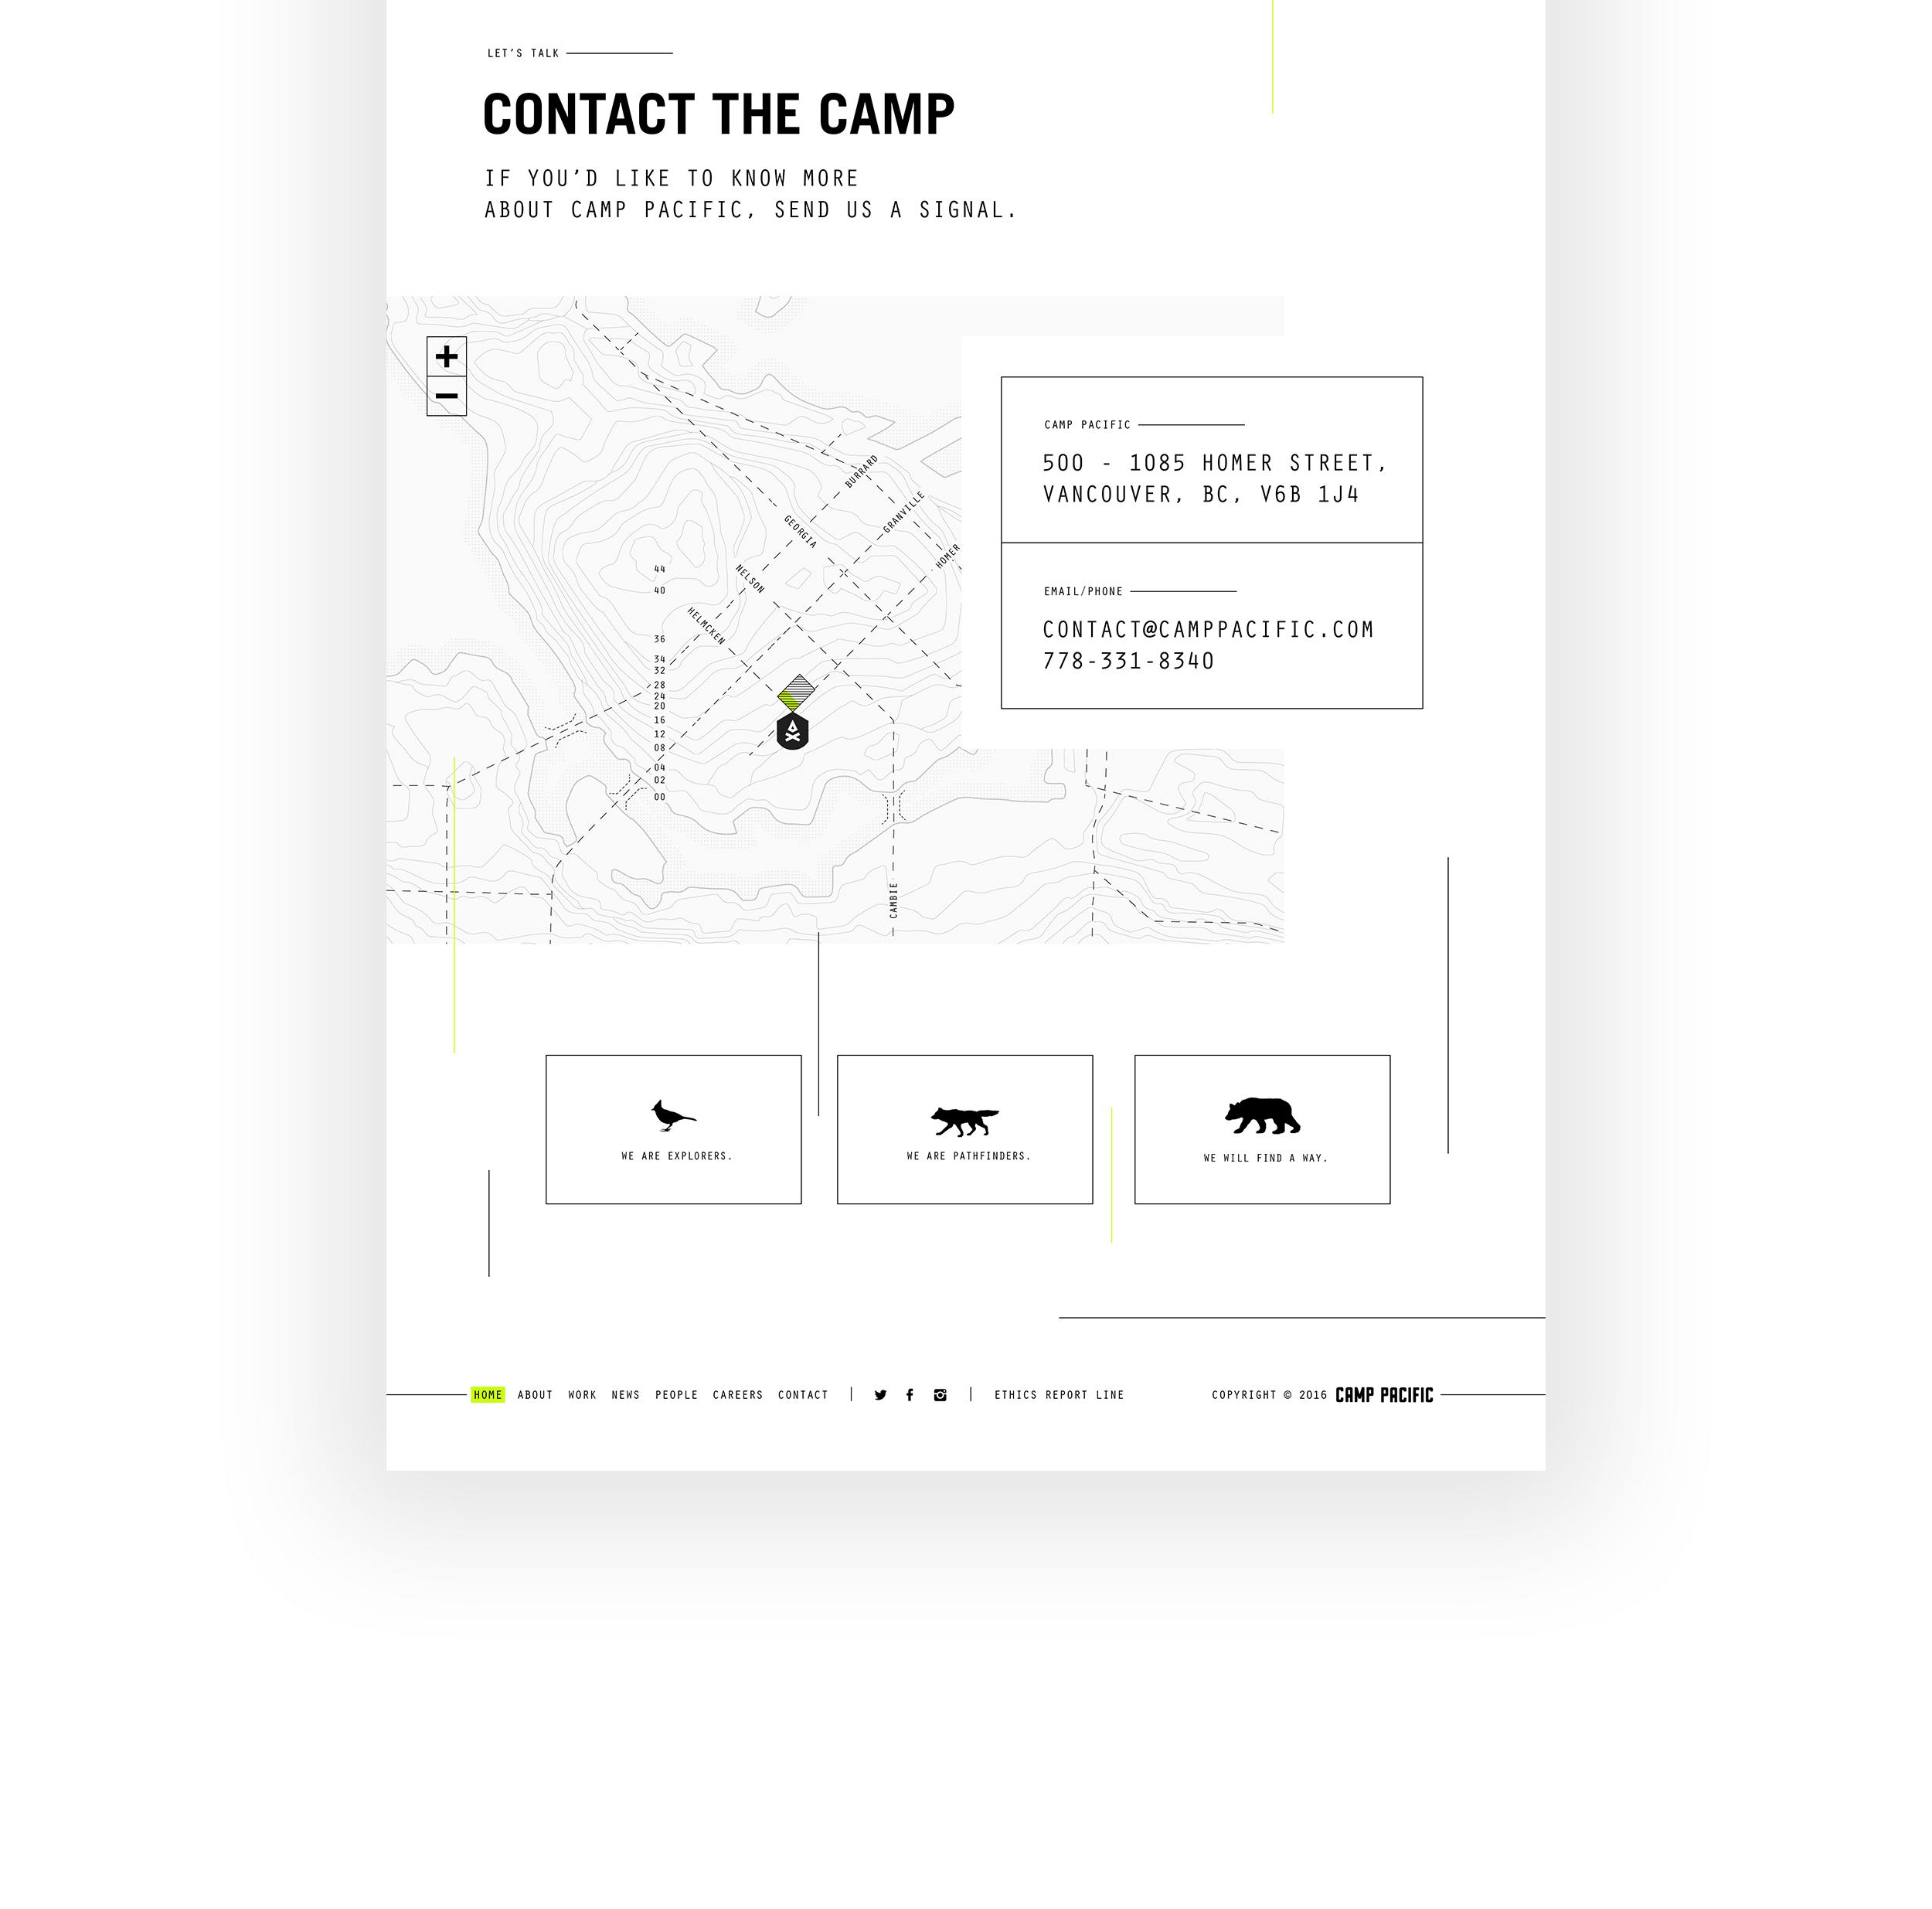 007-CampNewSite-Image-07_B